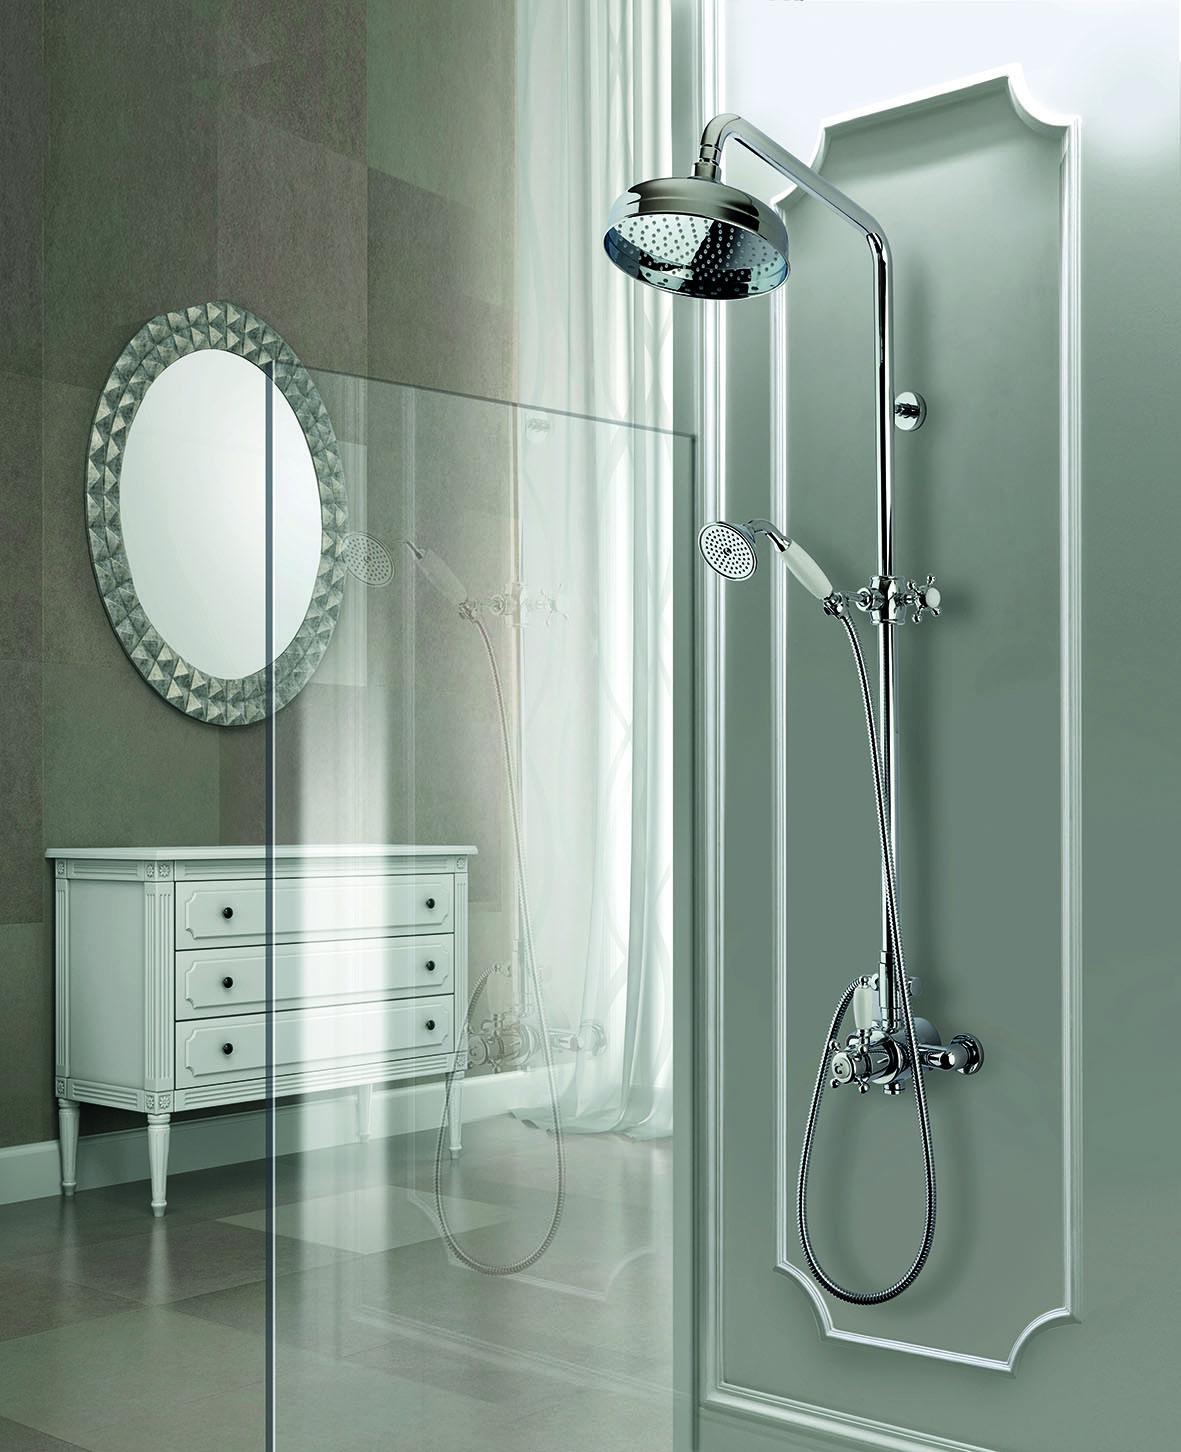 Catalog of Shower Gattoni Rubinetteria